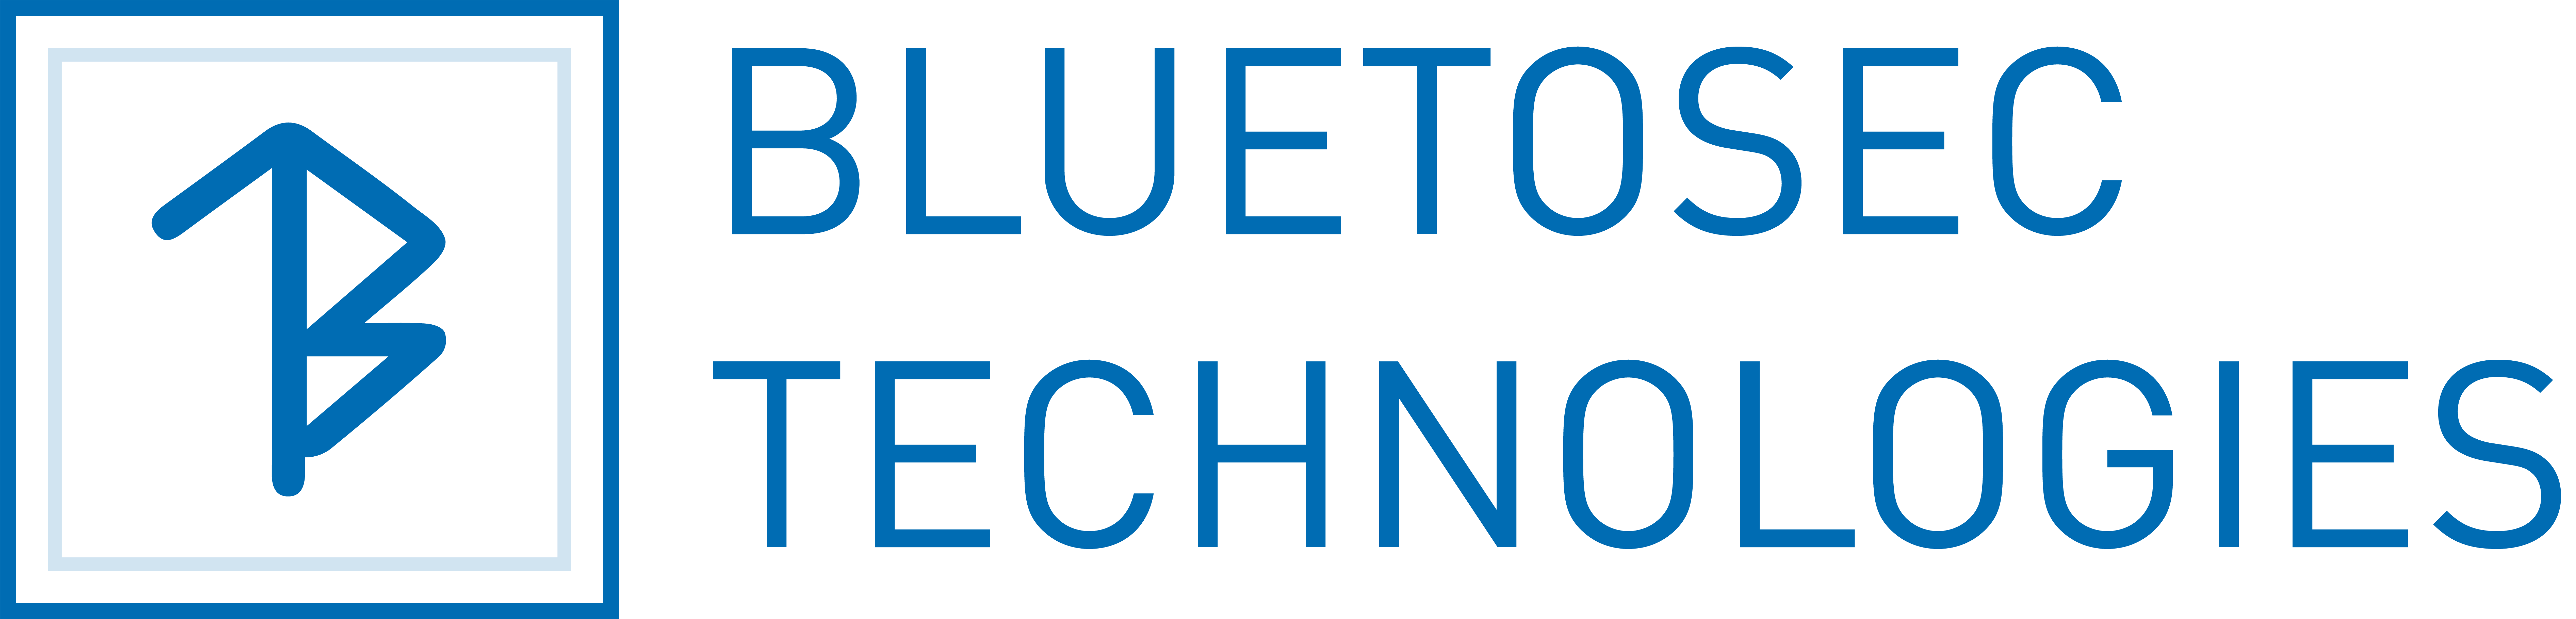 Bluetosec Technologies Logo